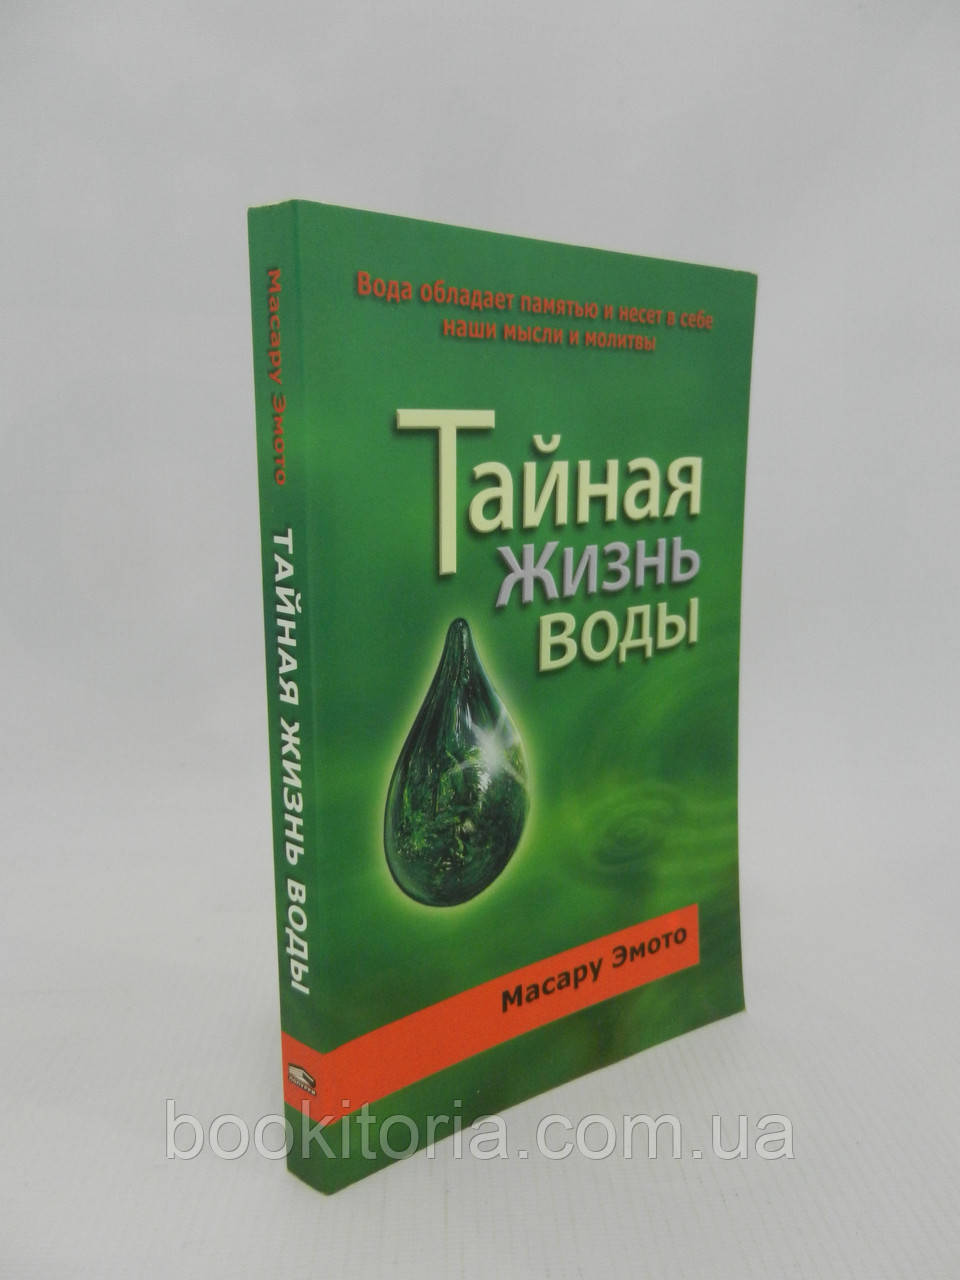 Эмото М. Тайная жизнь воды (б/у)., фото 1